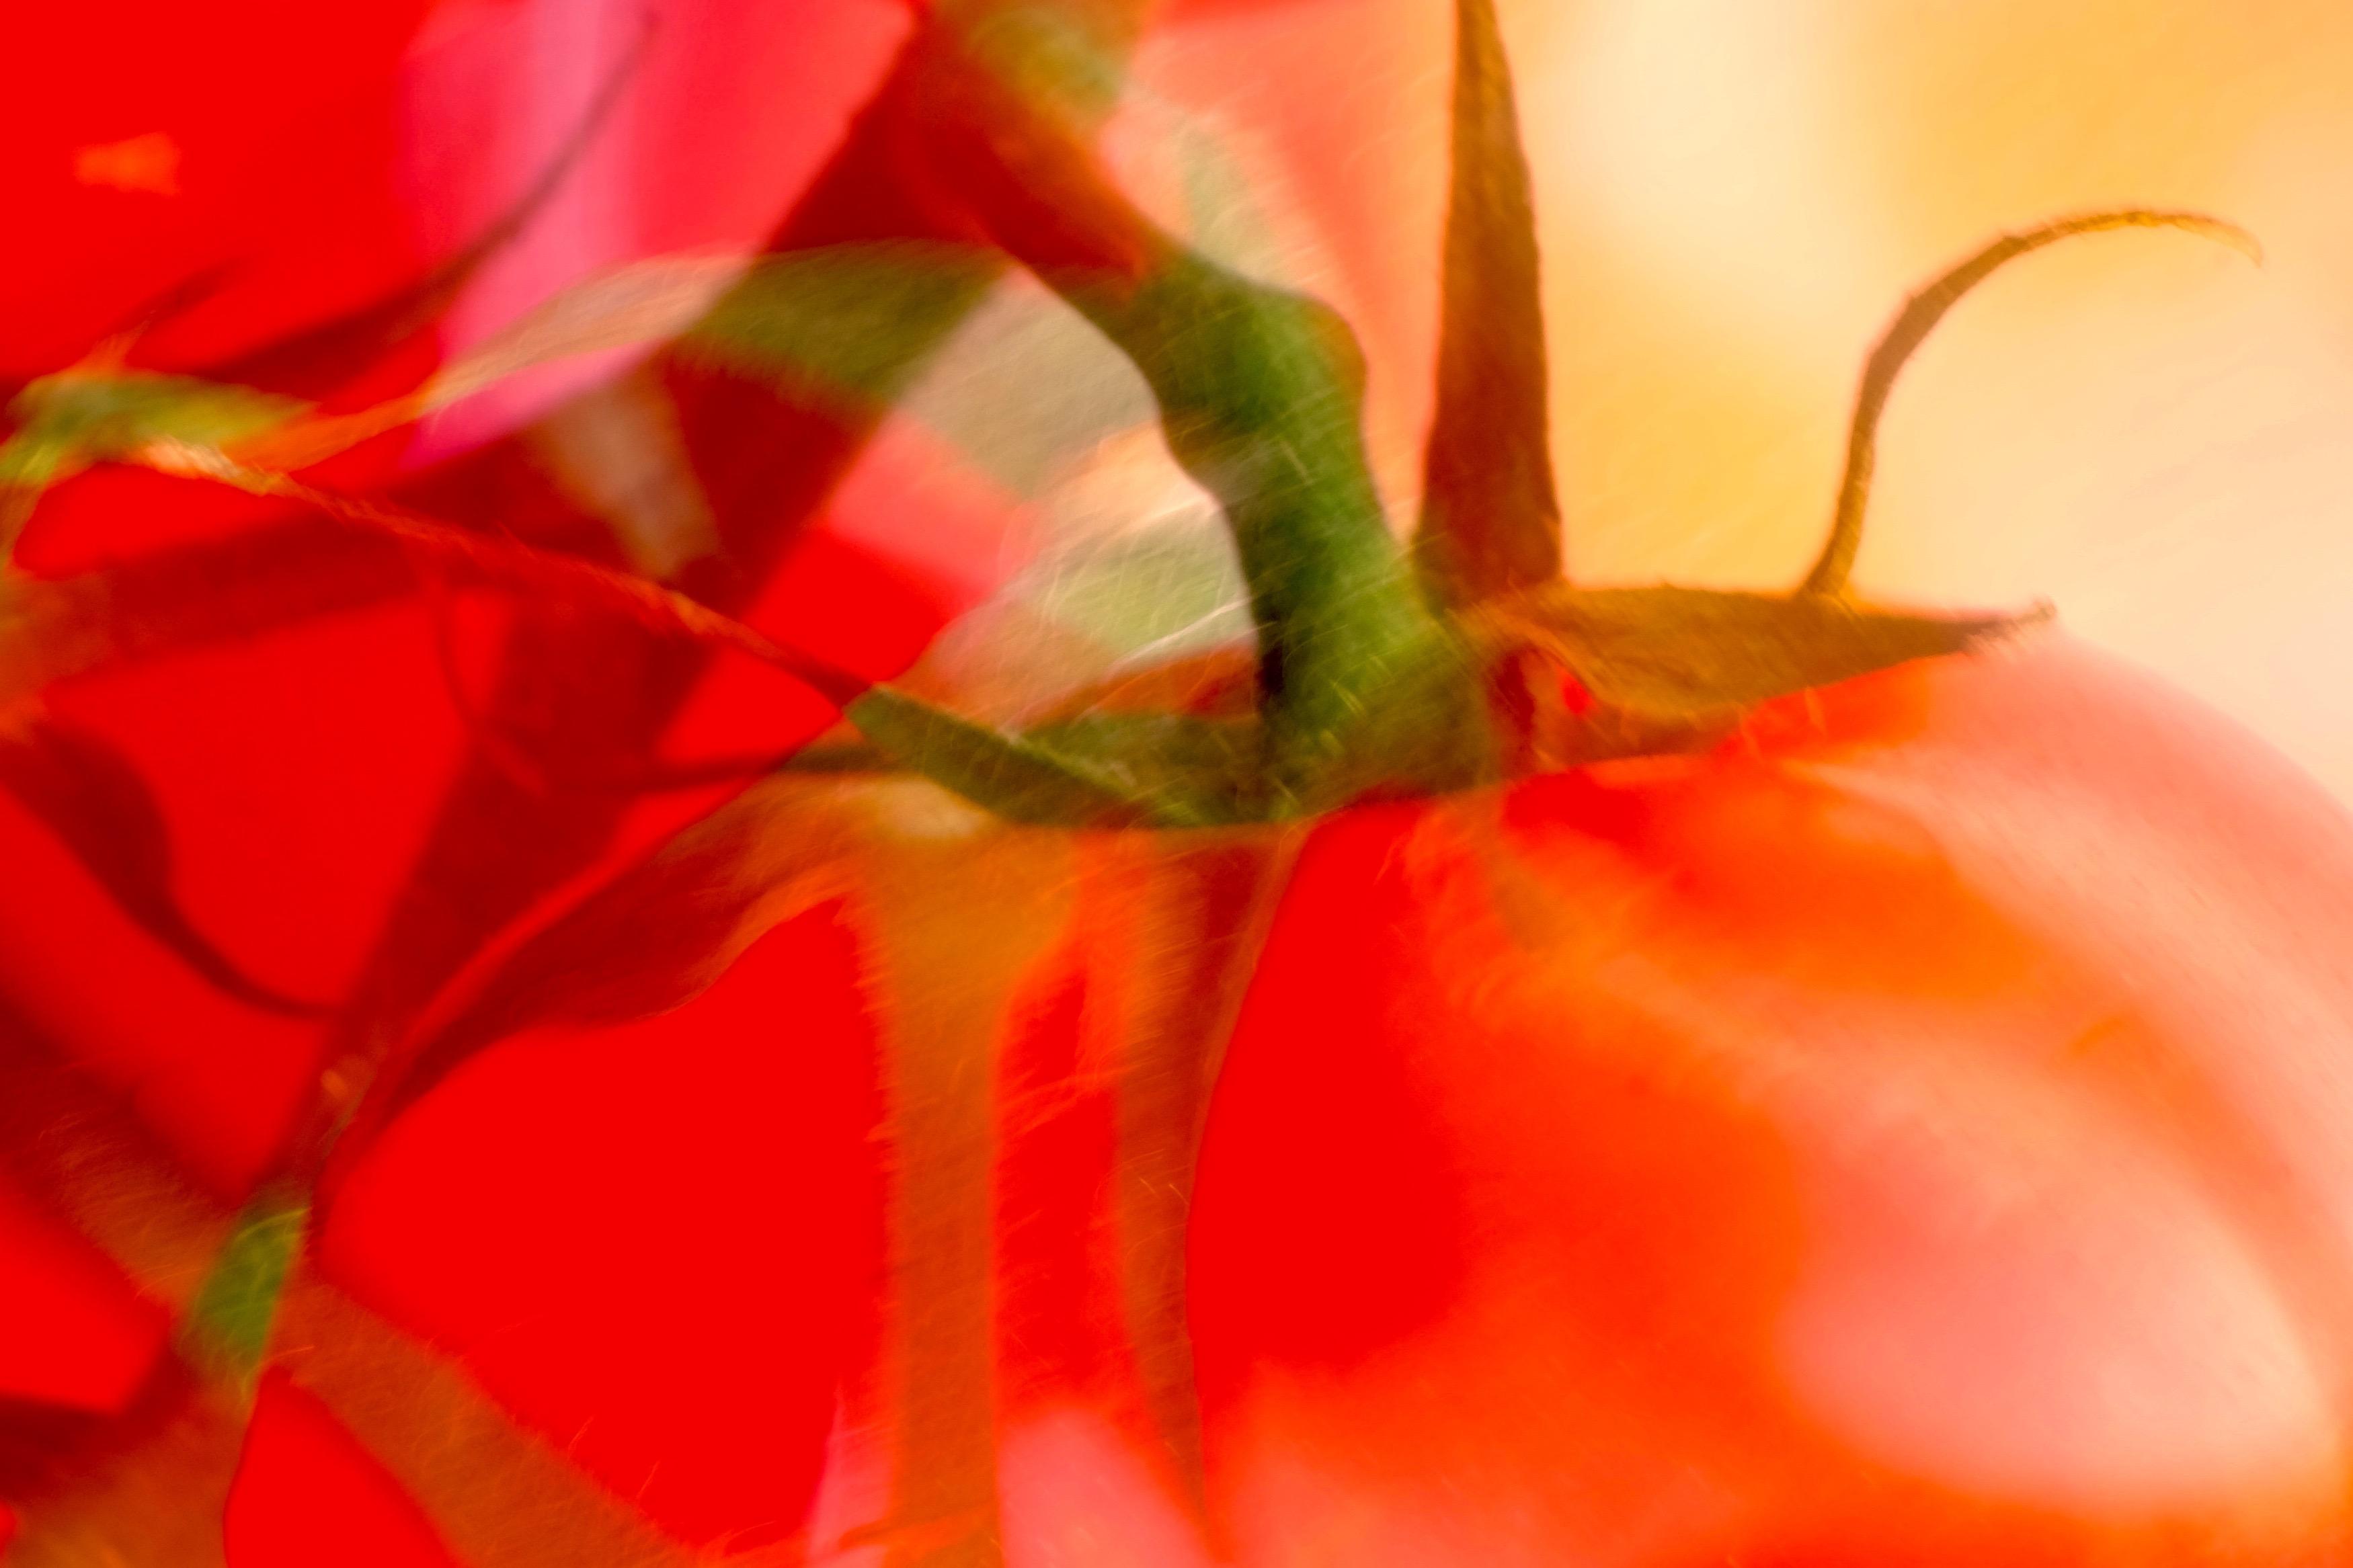 tomatoes 8 © KIM JONKER